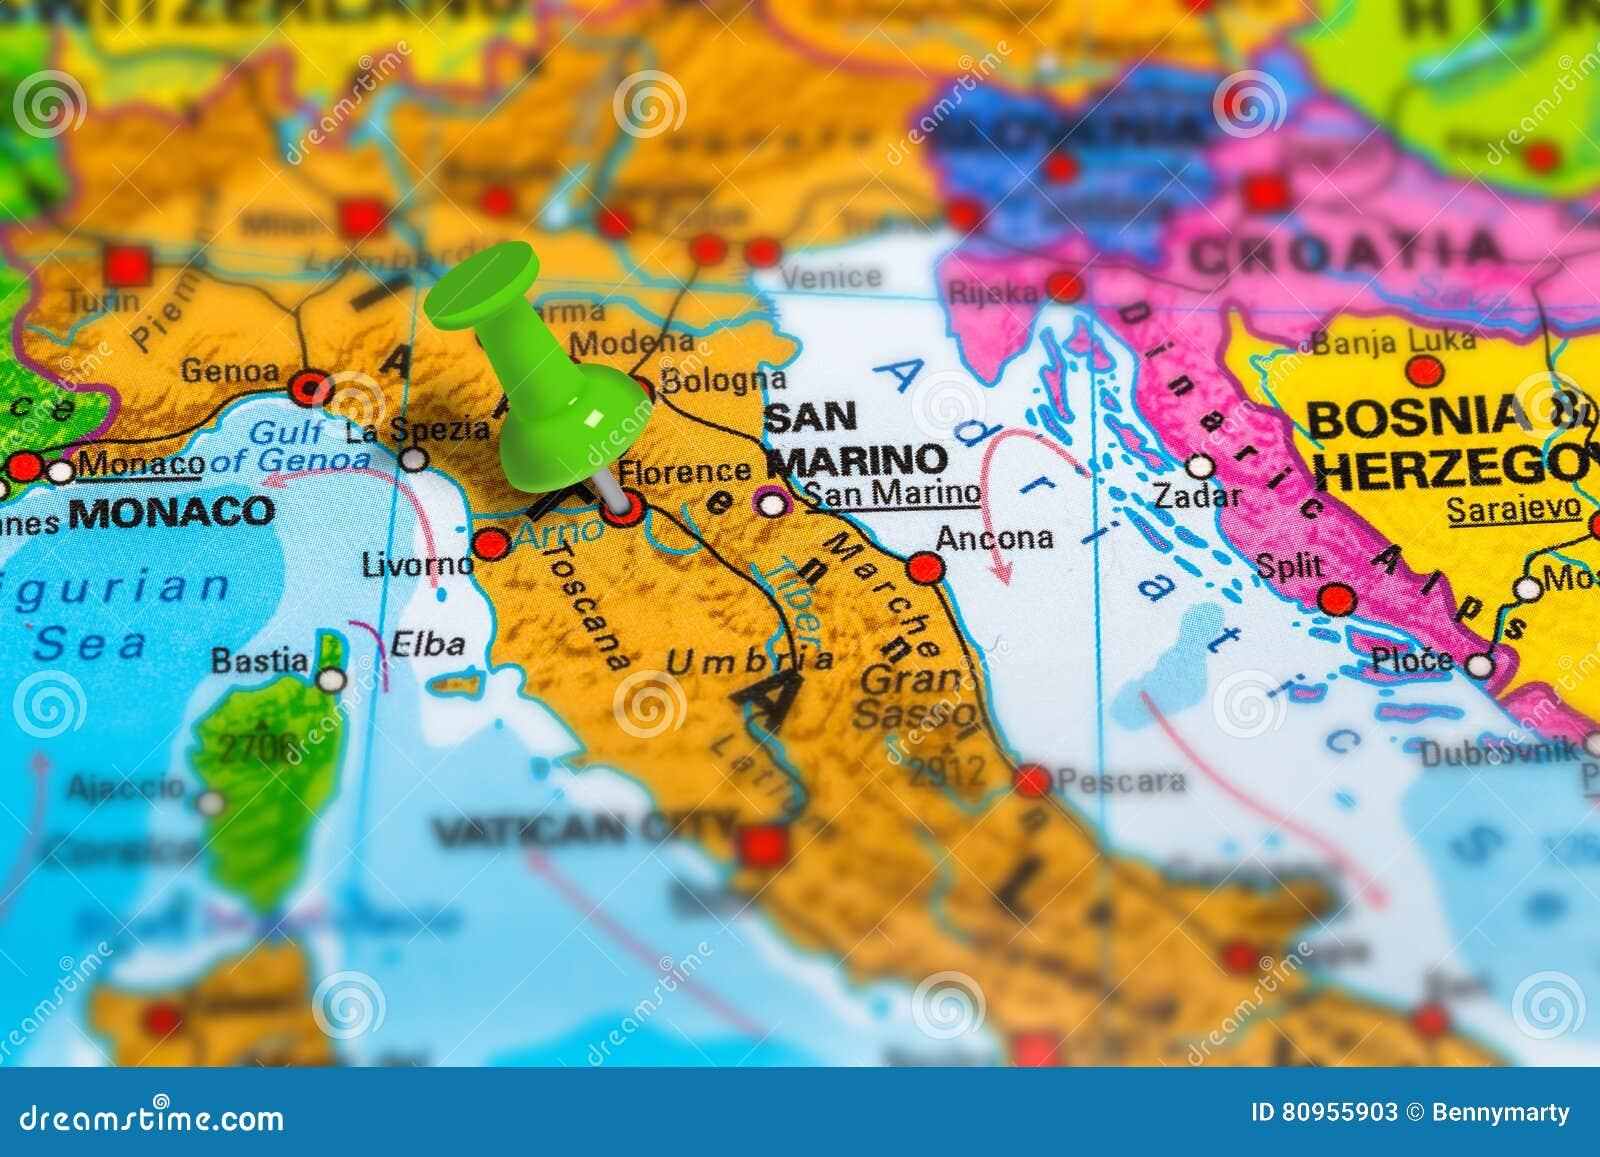 Florence Italy Map Stock Image Image Of Landmark Closeup 80955903